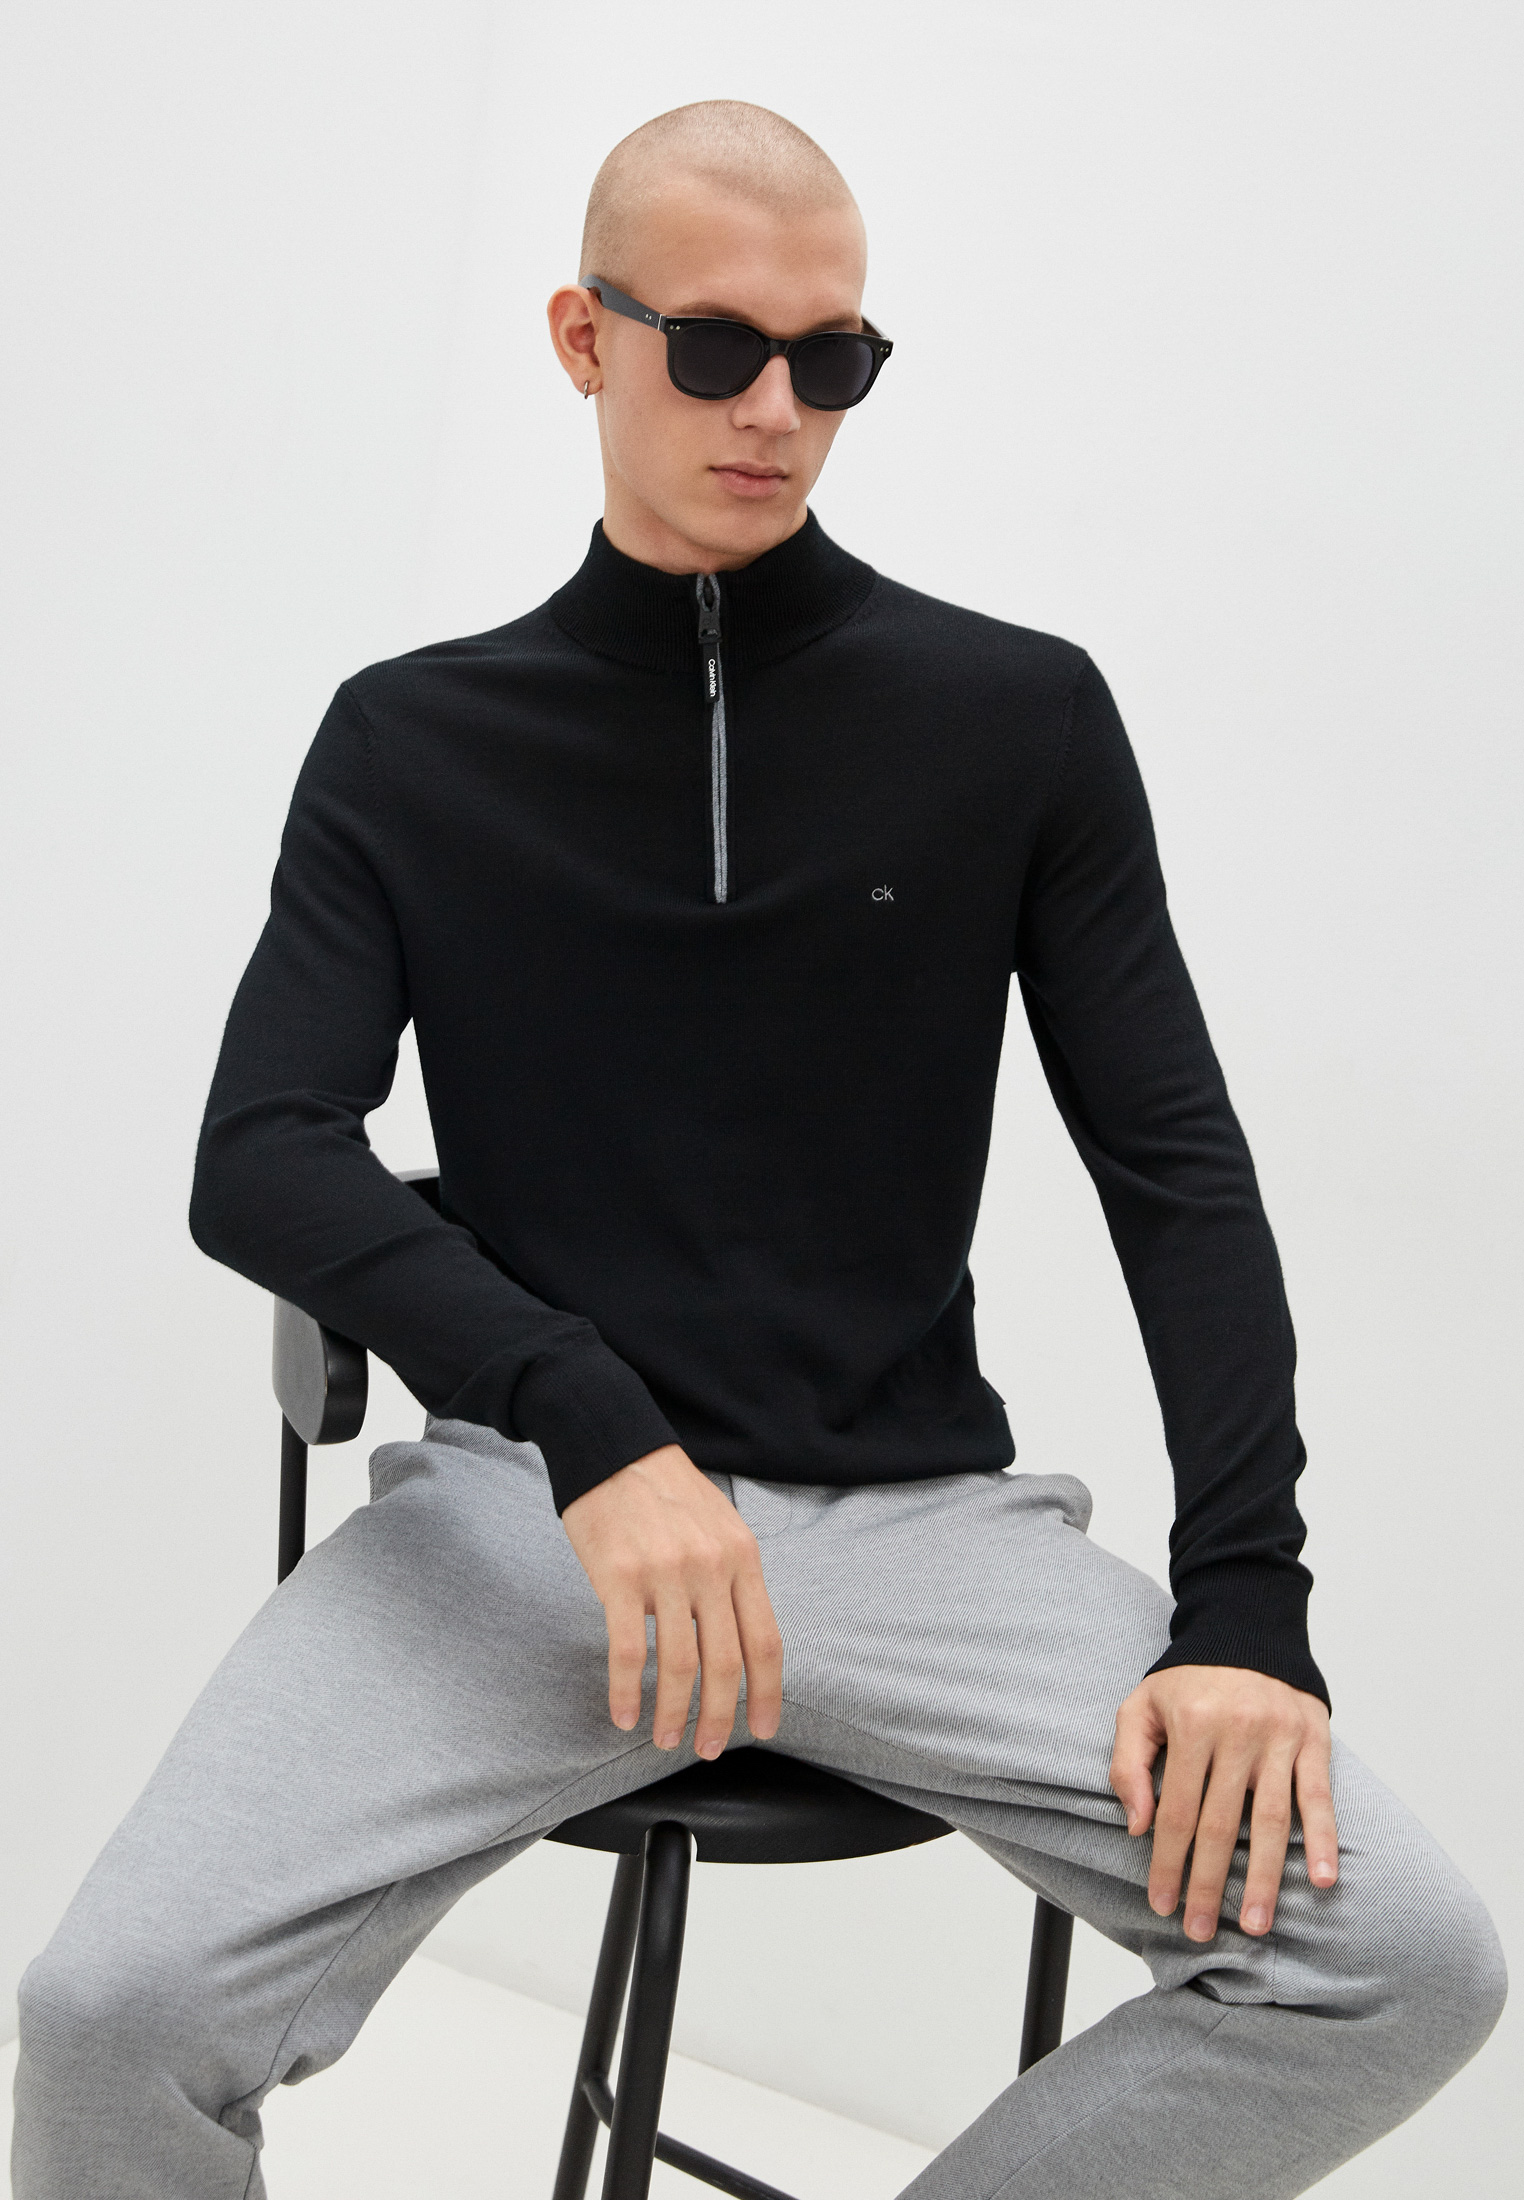 Джемпер Calvin Klein (Кельвин Кляйн) Джемпер Calvin Klein